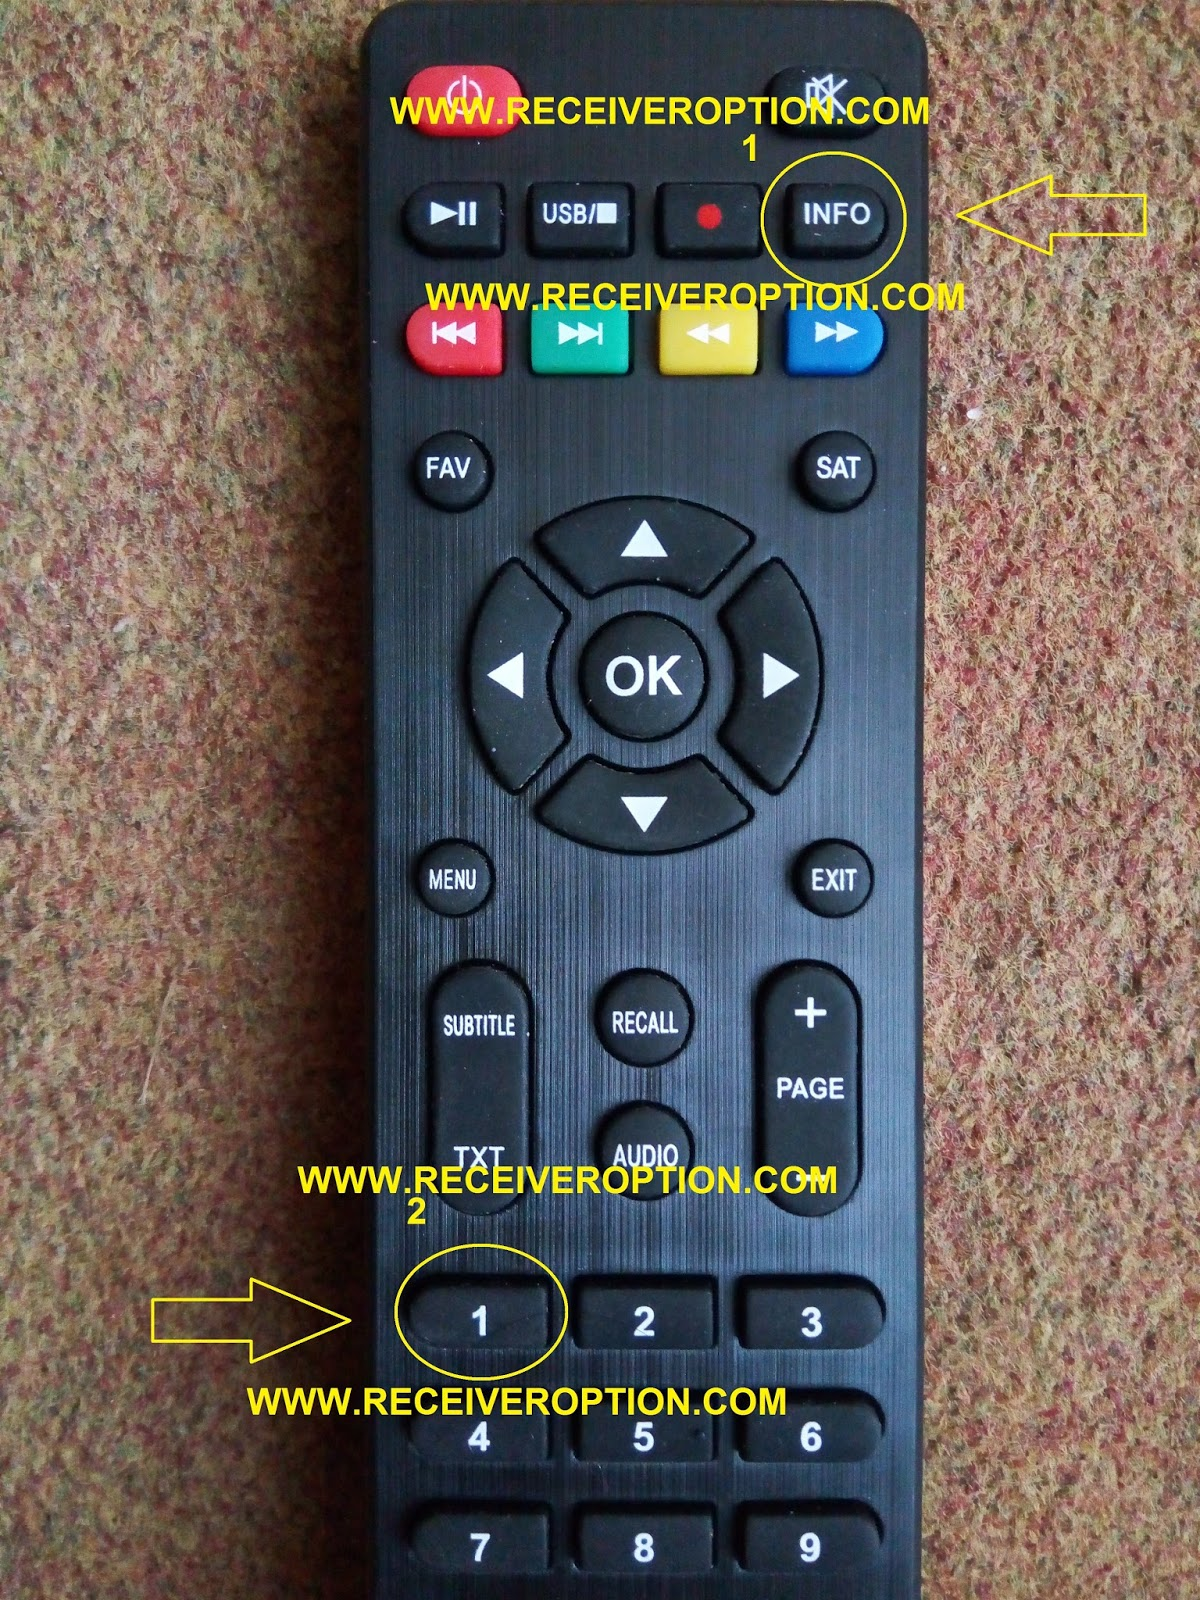 STAR TRACK SRT 550 GOLD HD RECEIVER BISS KEY OPTION - HOW TO ENTER